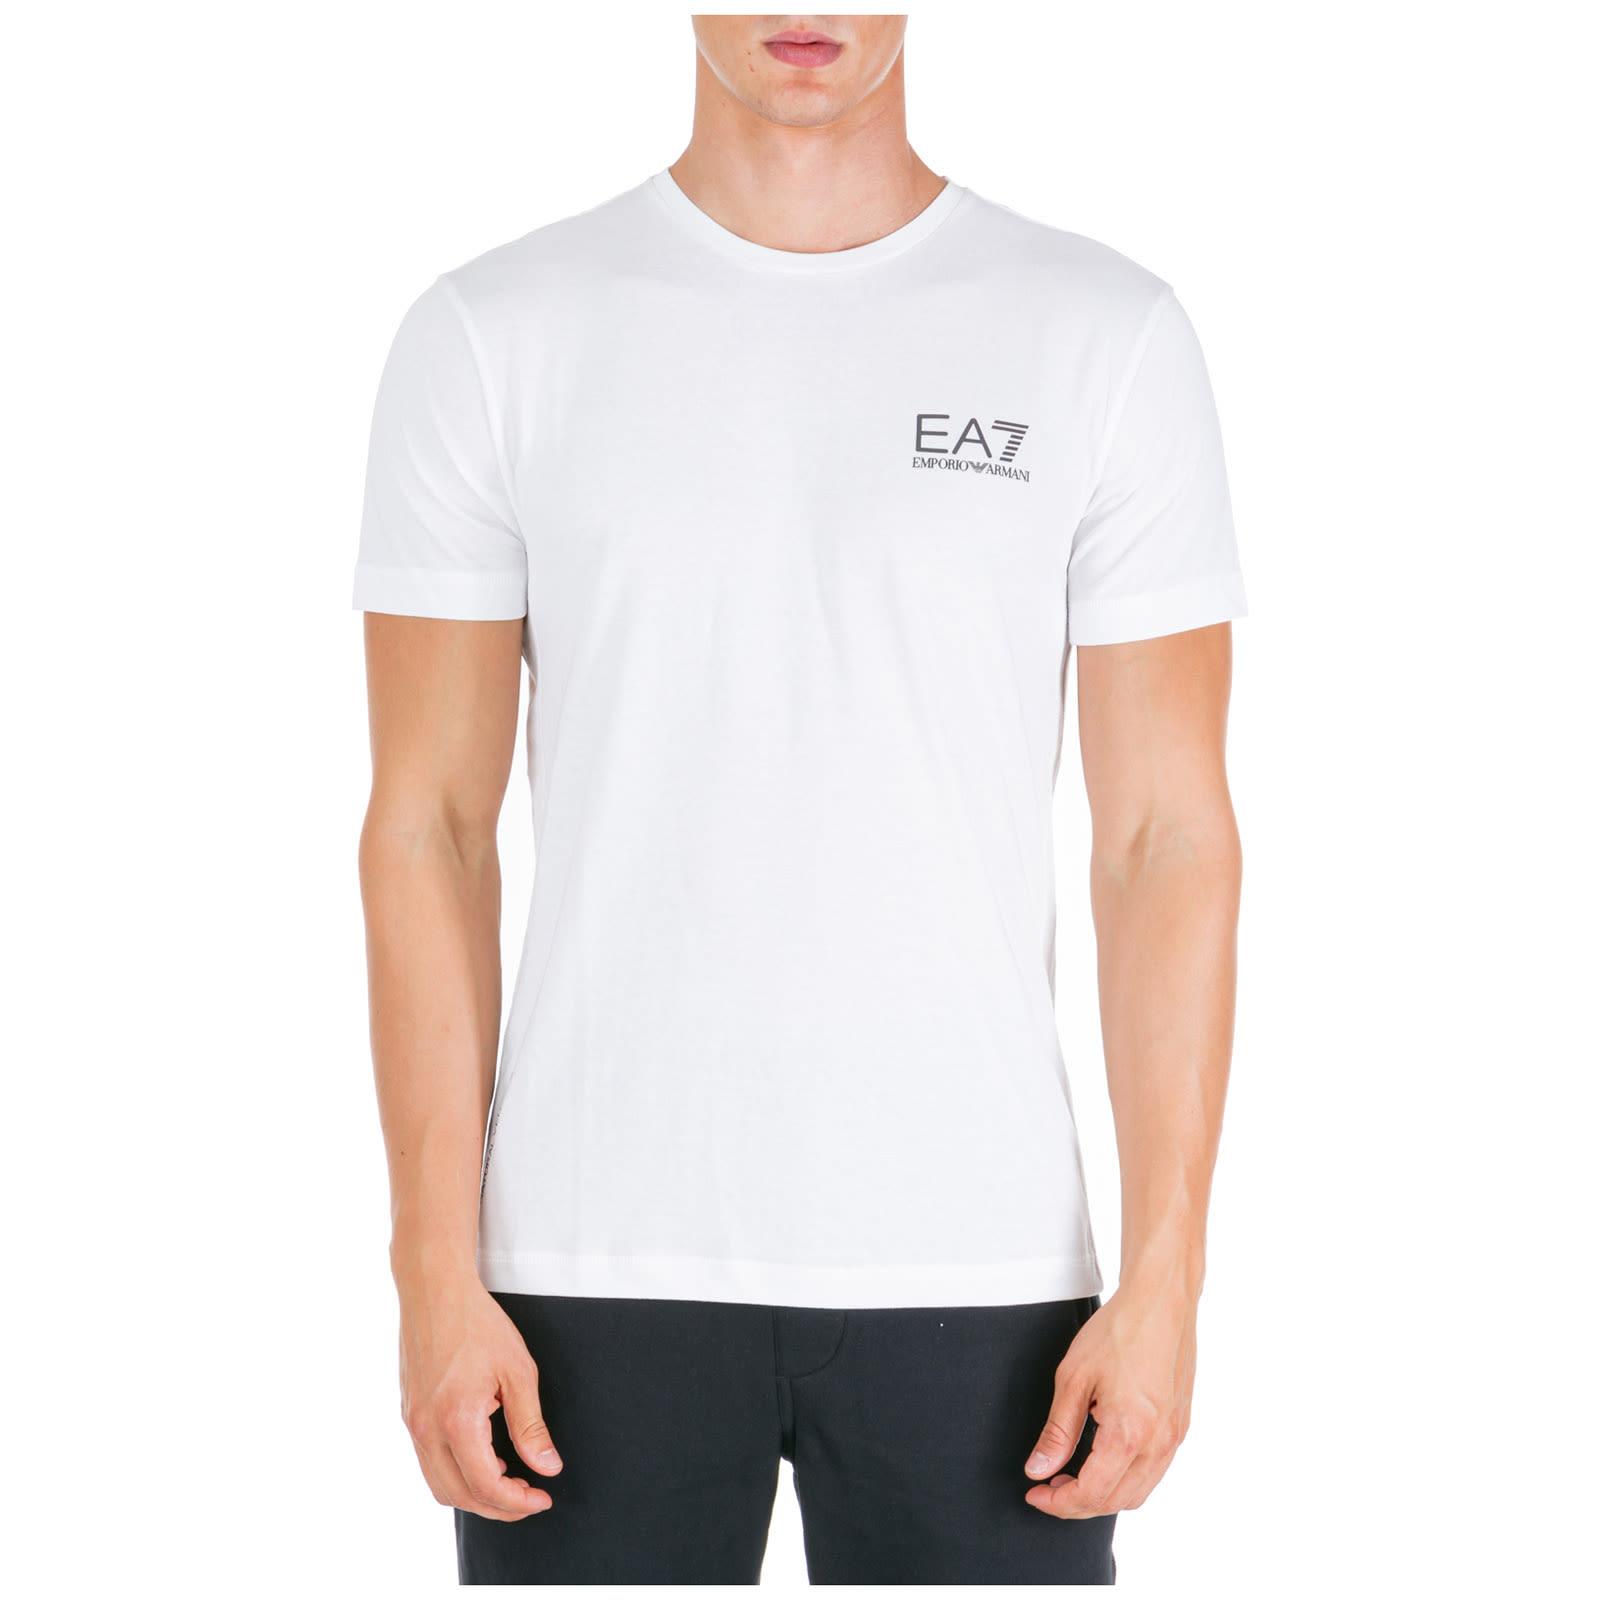 Emporio Armani Ea7 Universal Globe T-shirt